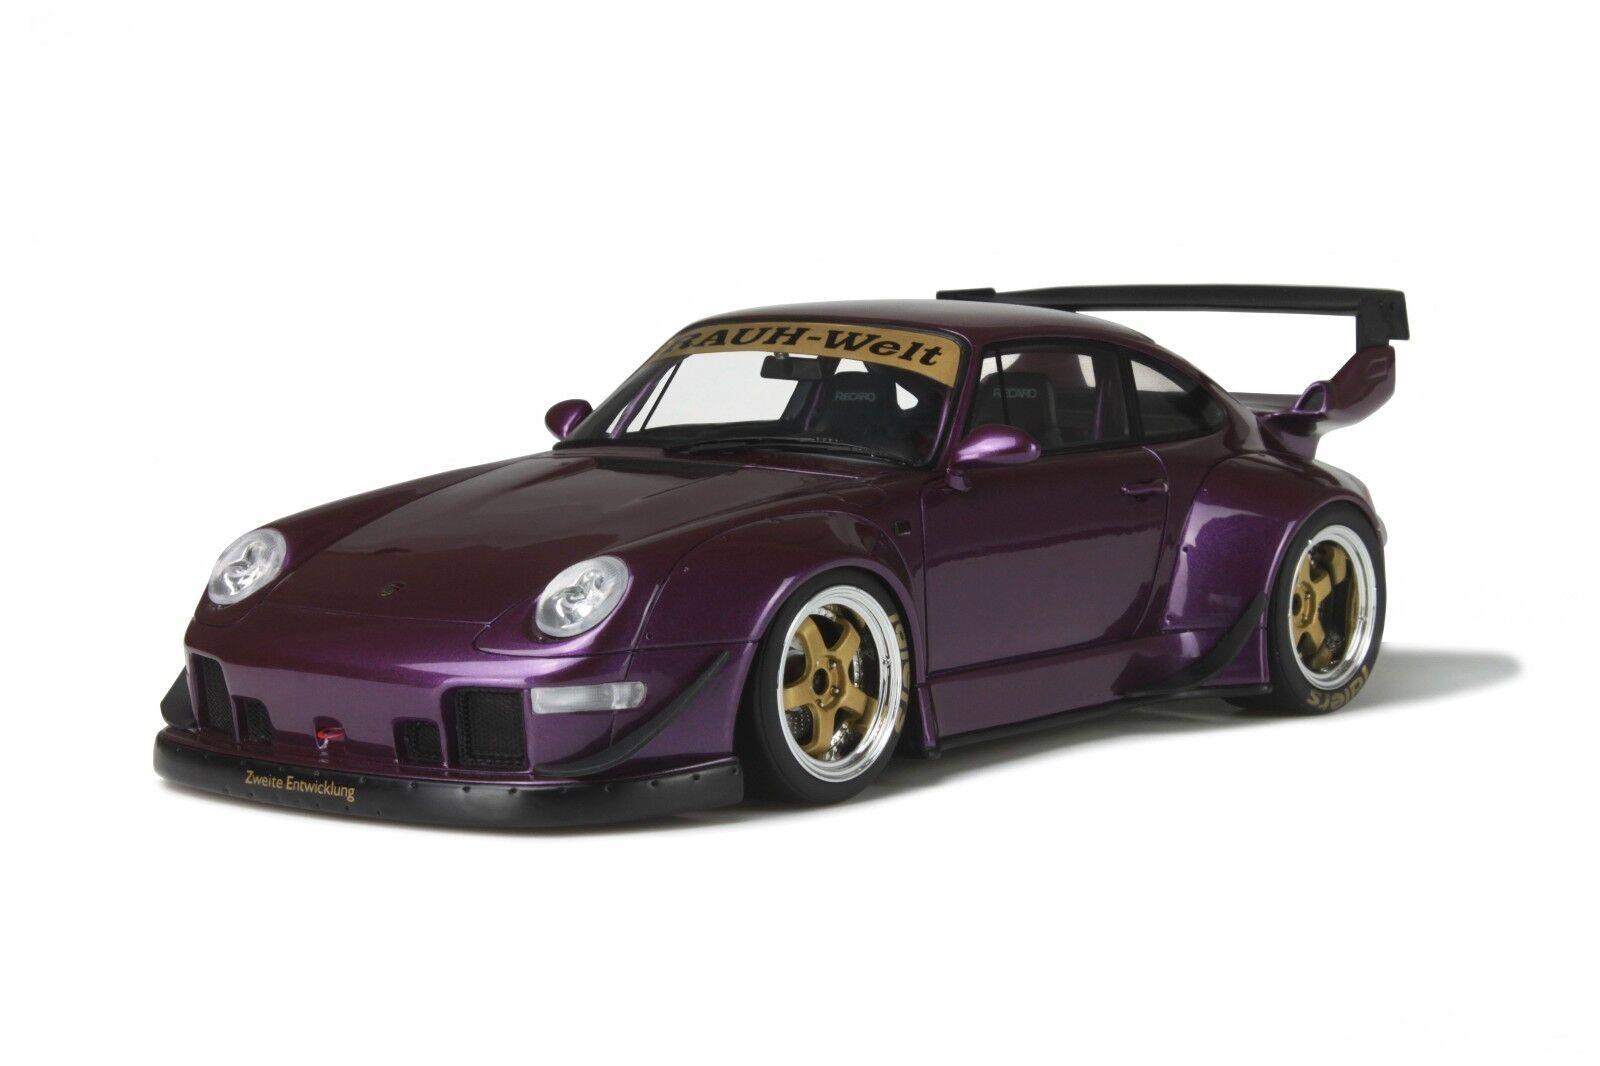 1 18 gt spirit GT727 porsche 911 (993) rsf rsf rsf rauh welt. violet 73da09